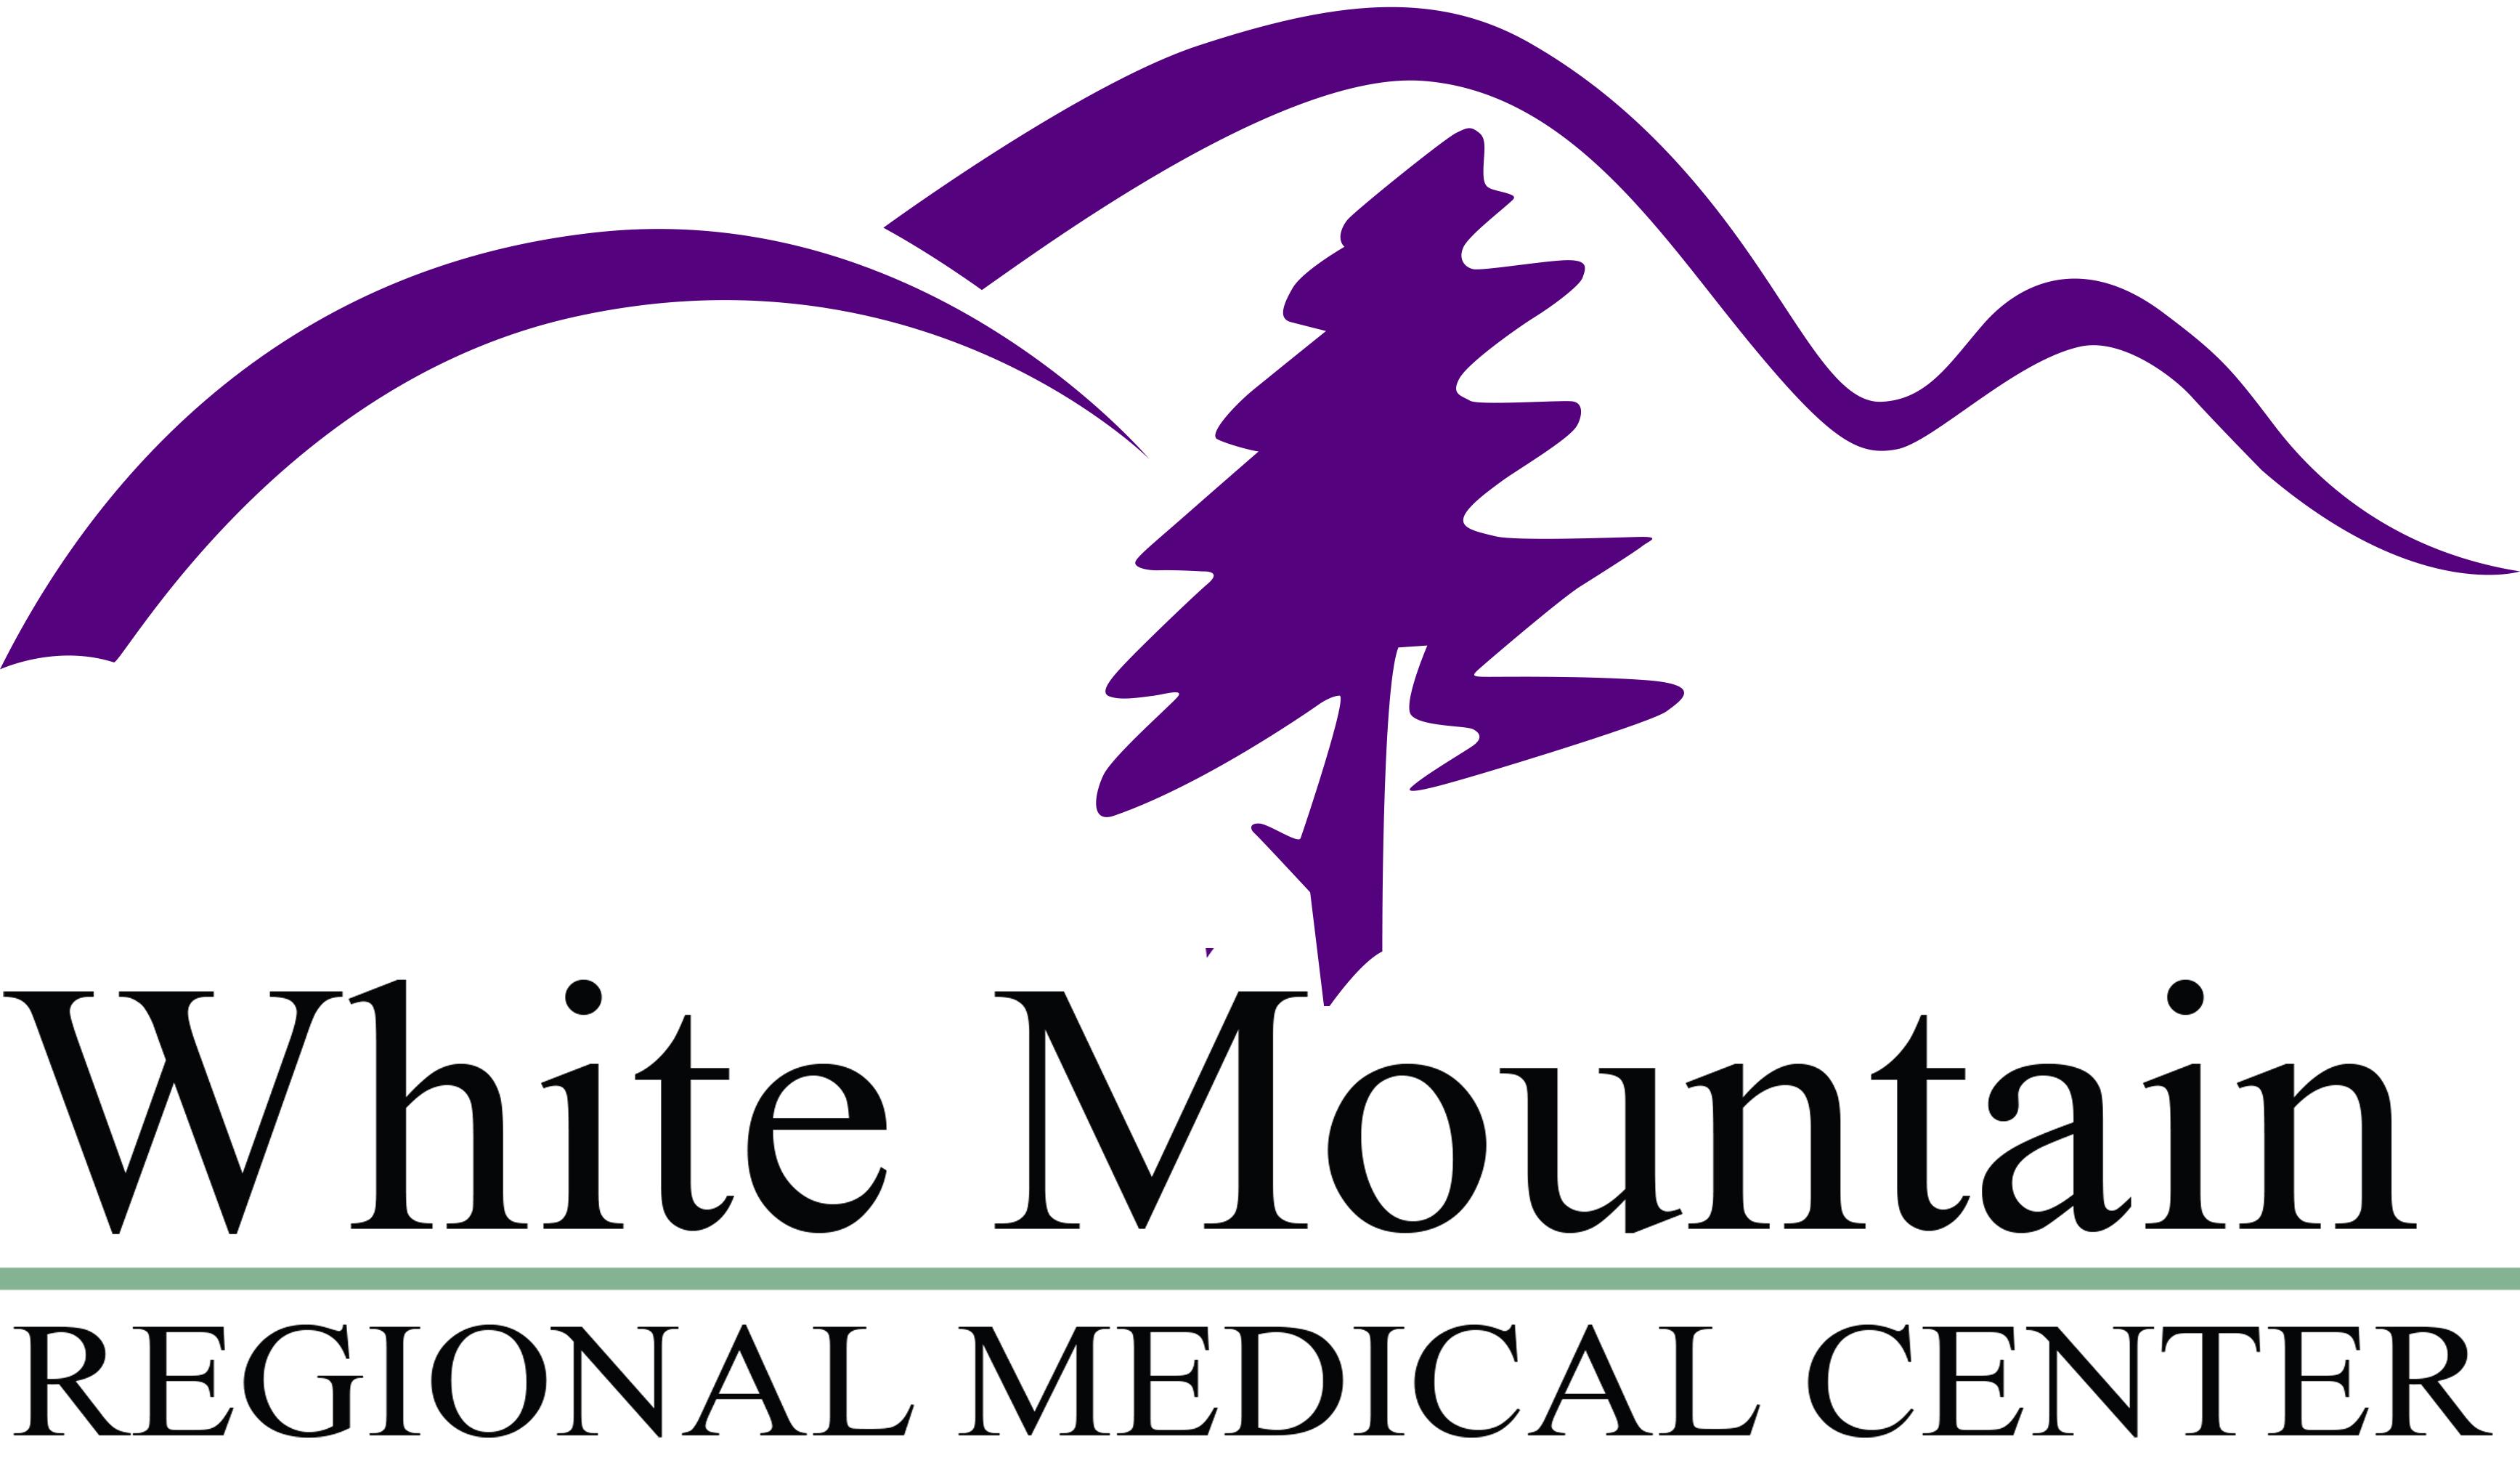 WMRMC Logo